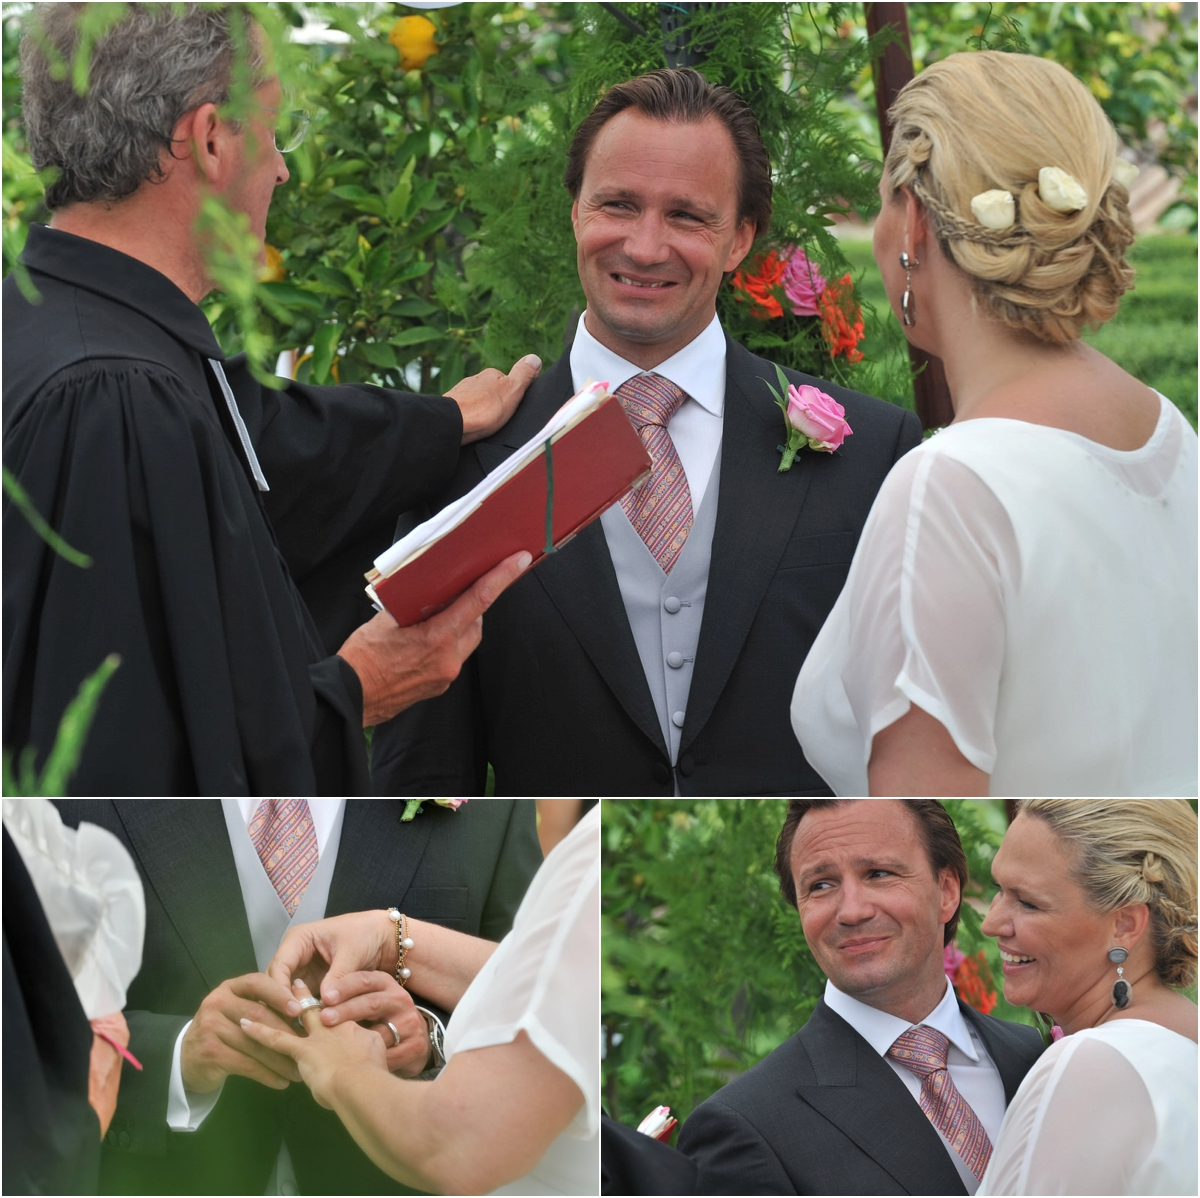 the_tuscany_wedding_blog_rappold_19.jpg